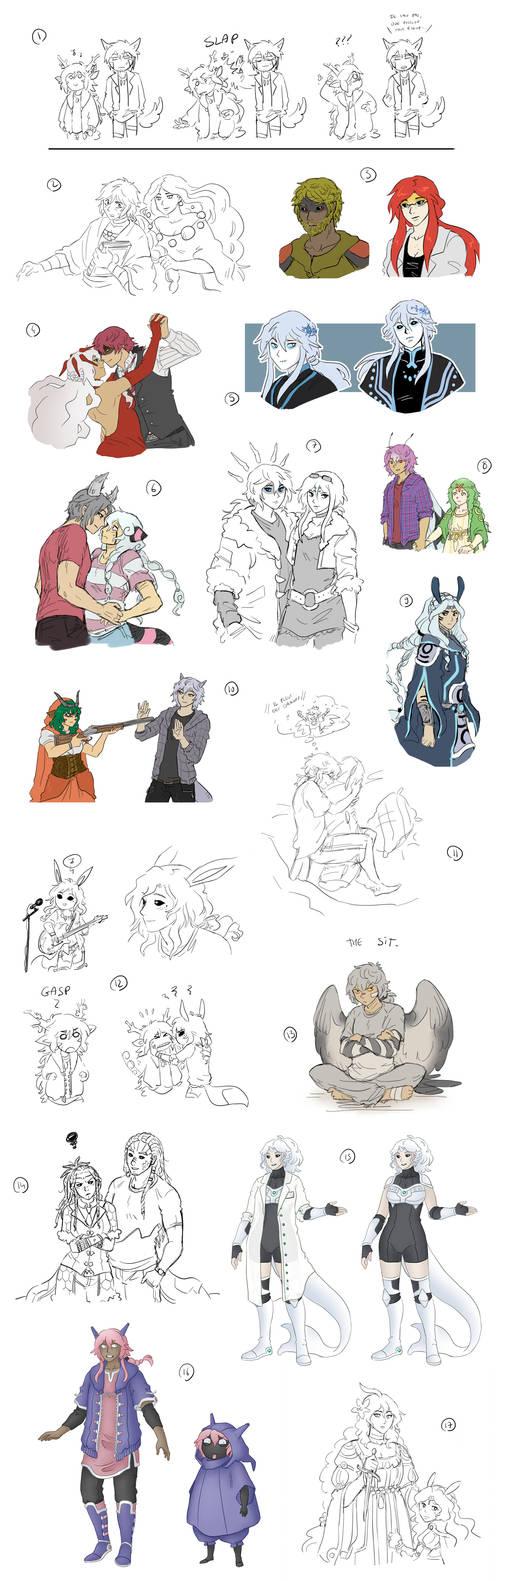 [Gijinkas] Sketchdump 4